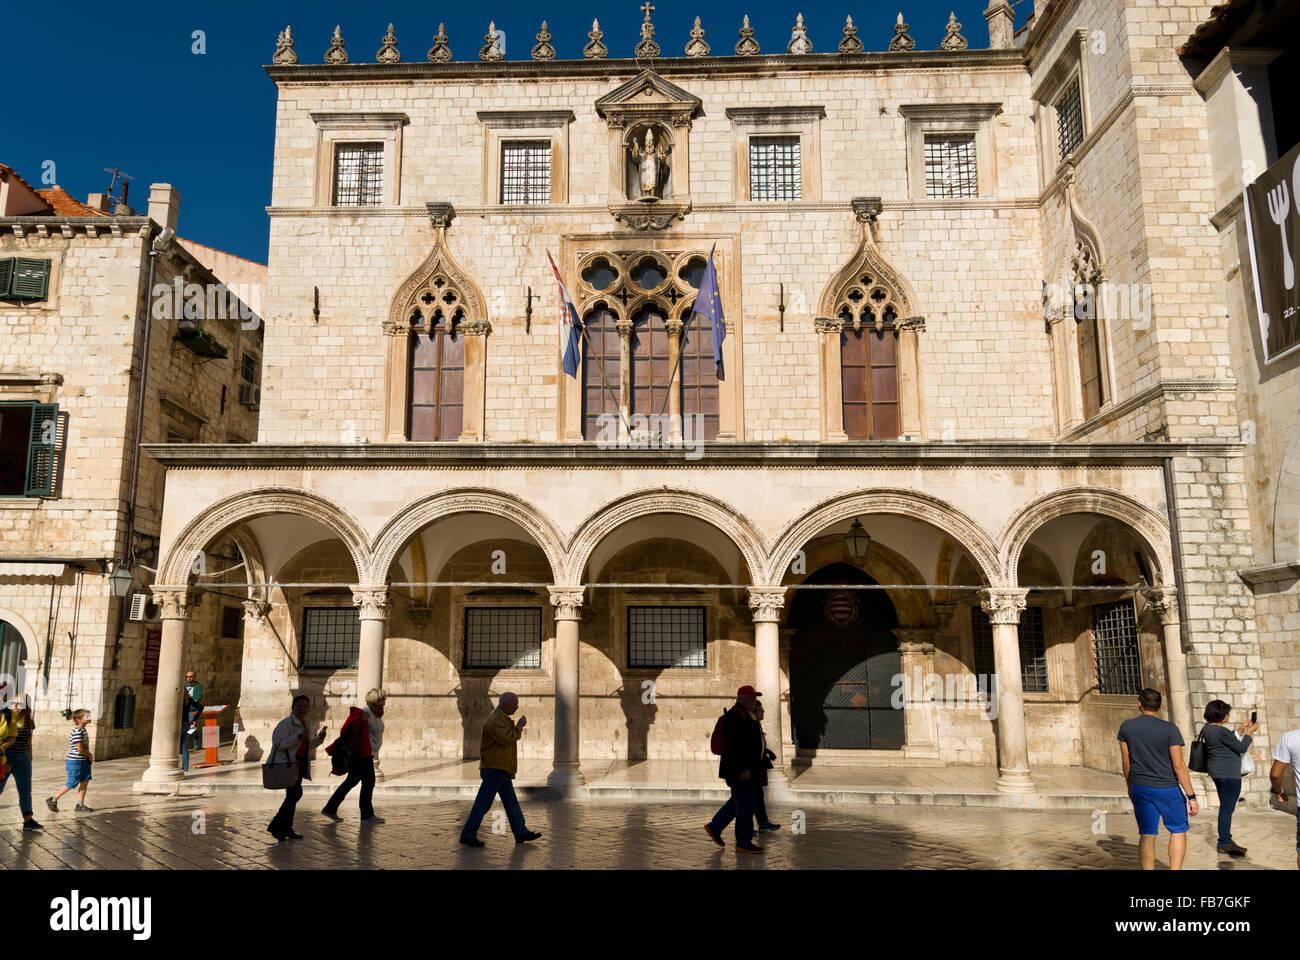 The Sponza Palace in the Stradun, in Dubrovnik. - Stock Image